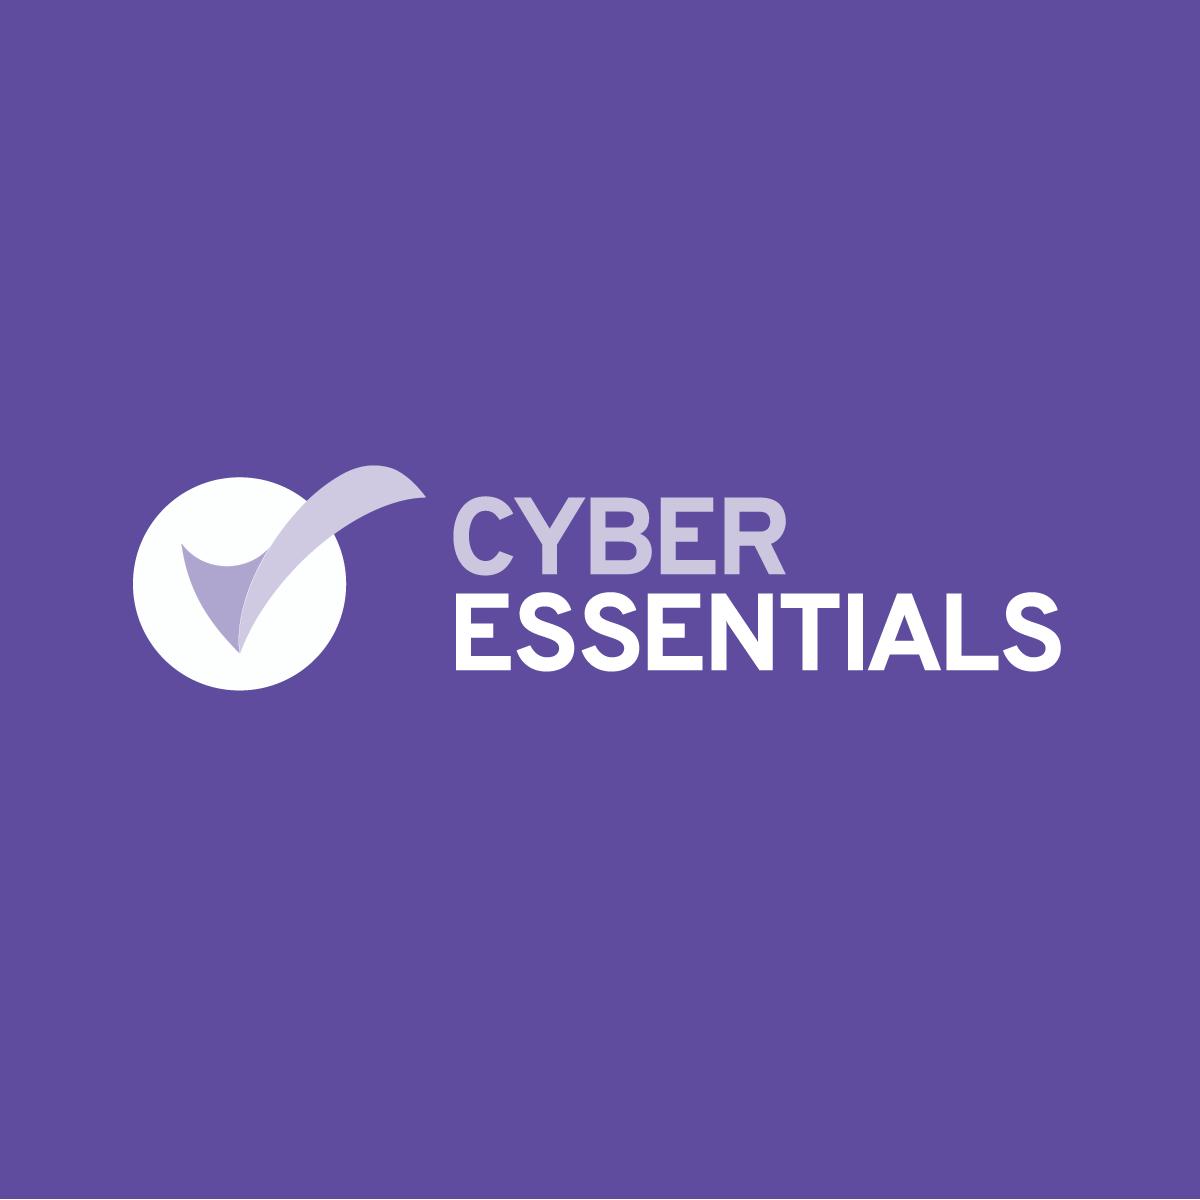 Cyber Essentials logo on purple